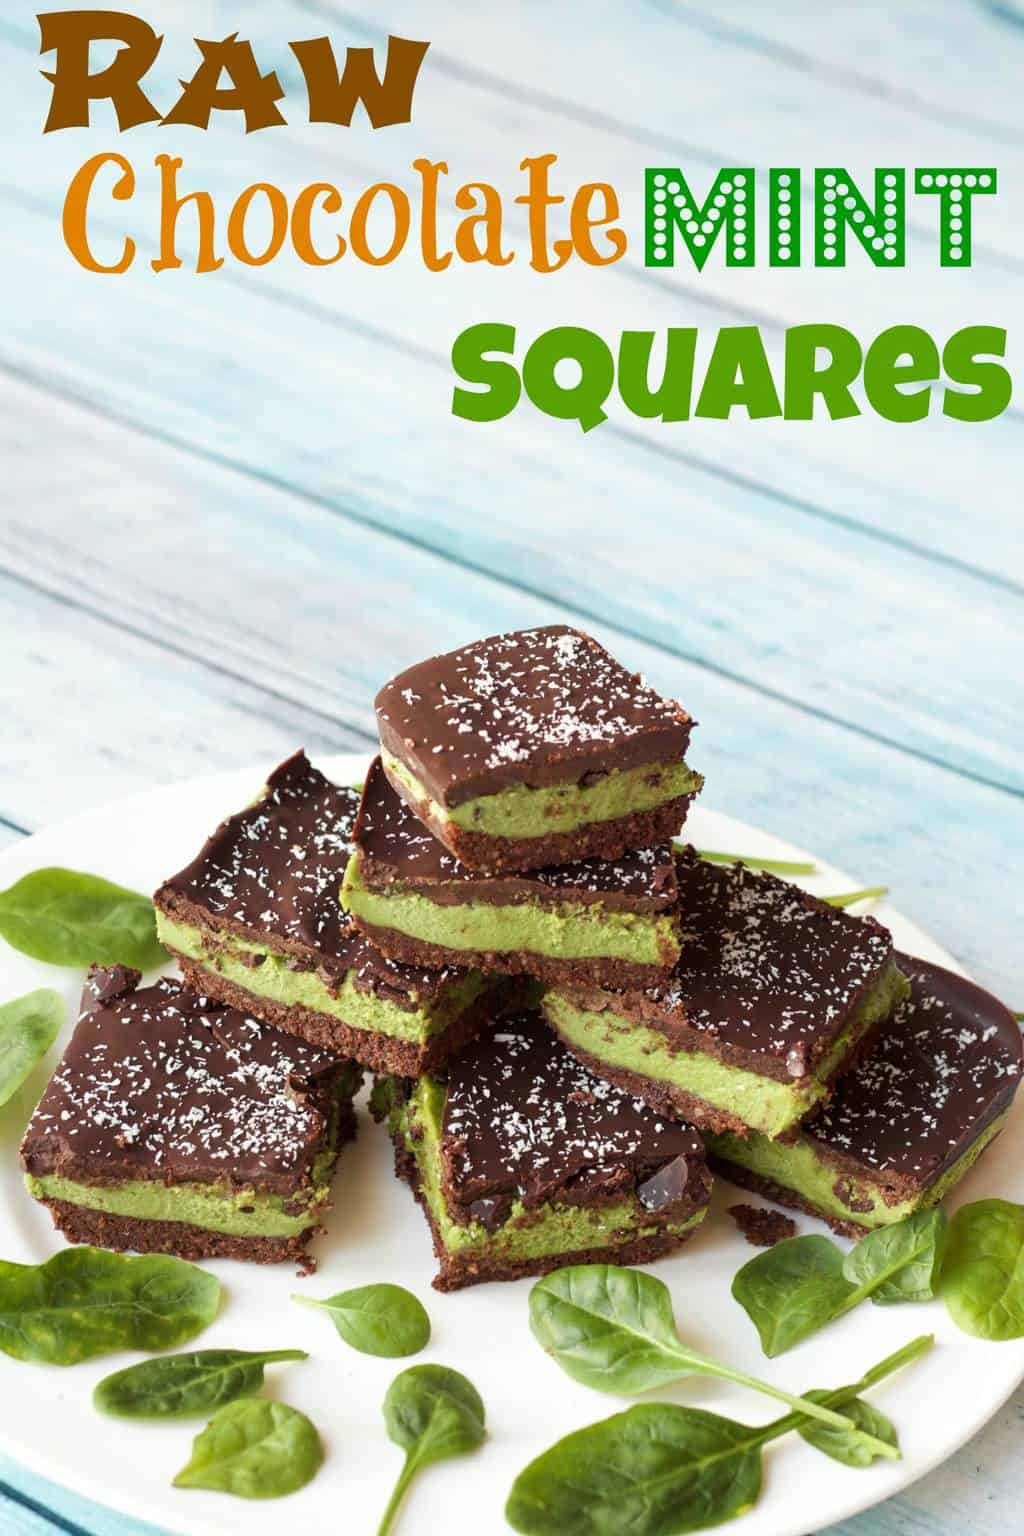 Raw Chocolate Mint Squares #vegan #rawvegan #glutenfree #lovingitvegan #desserts